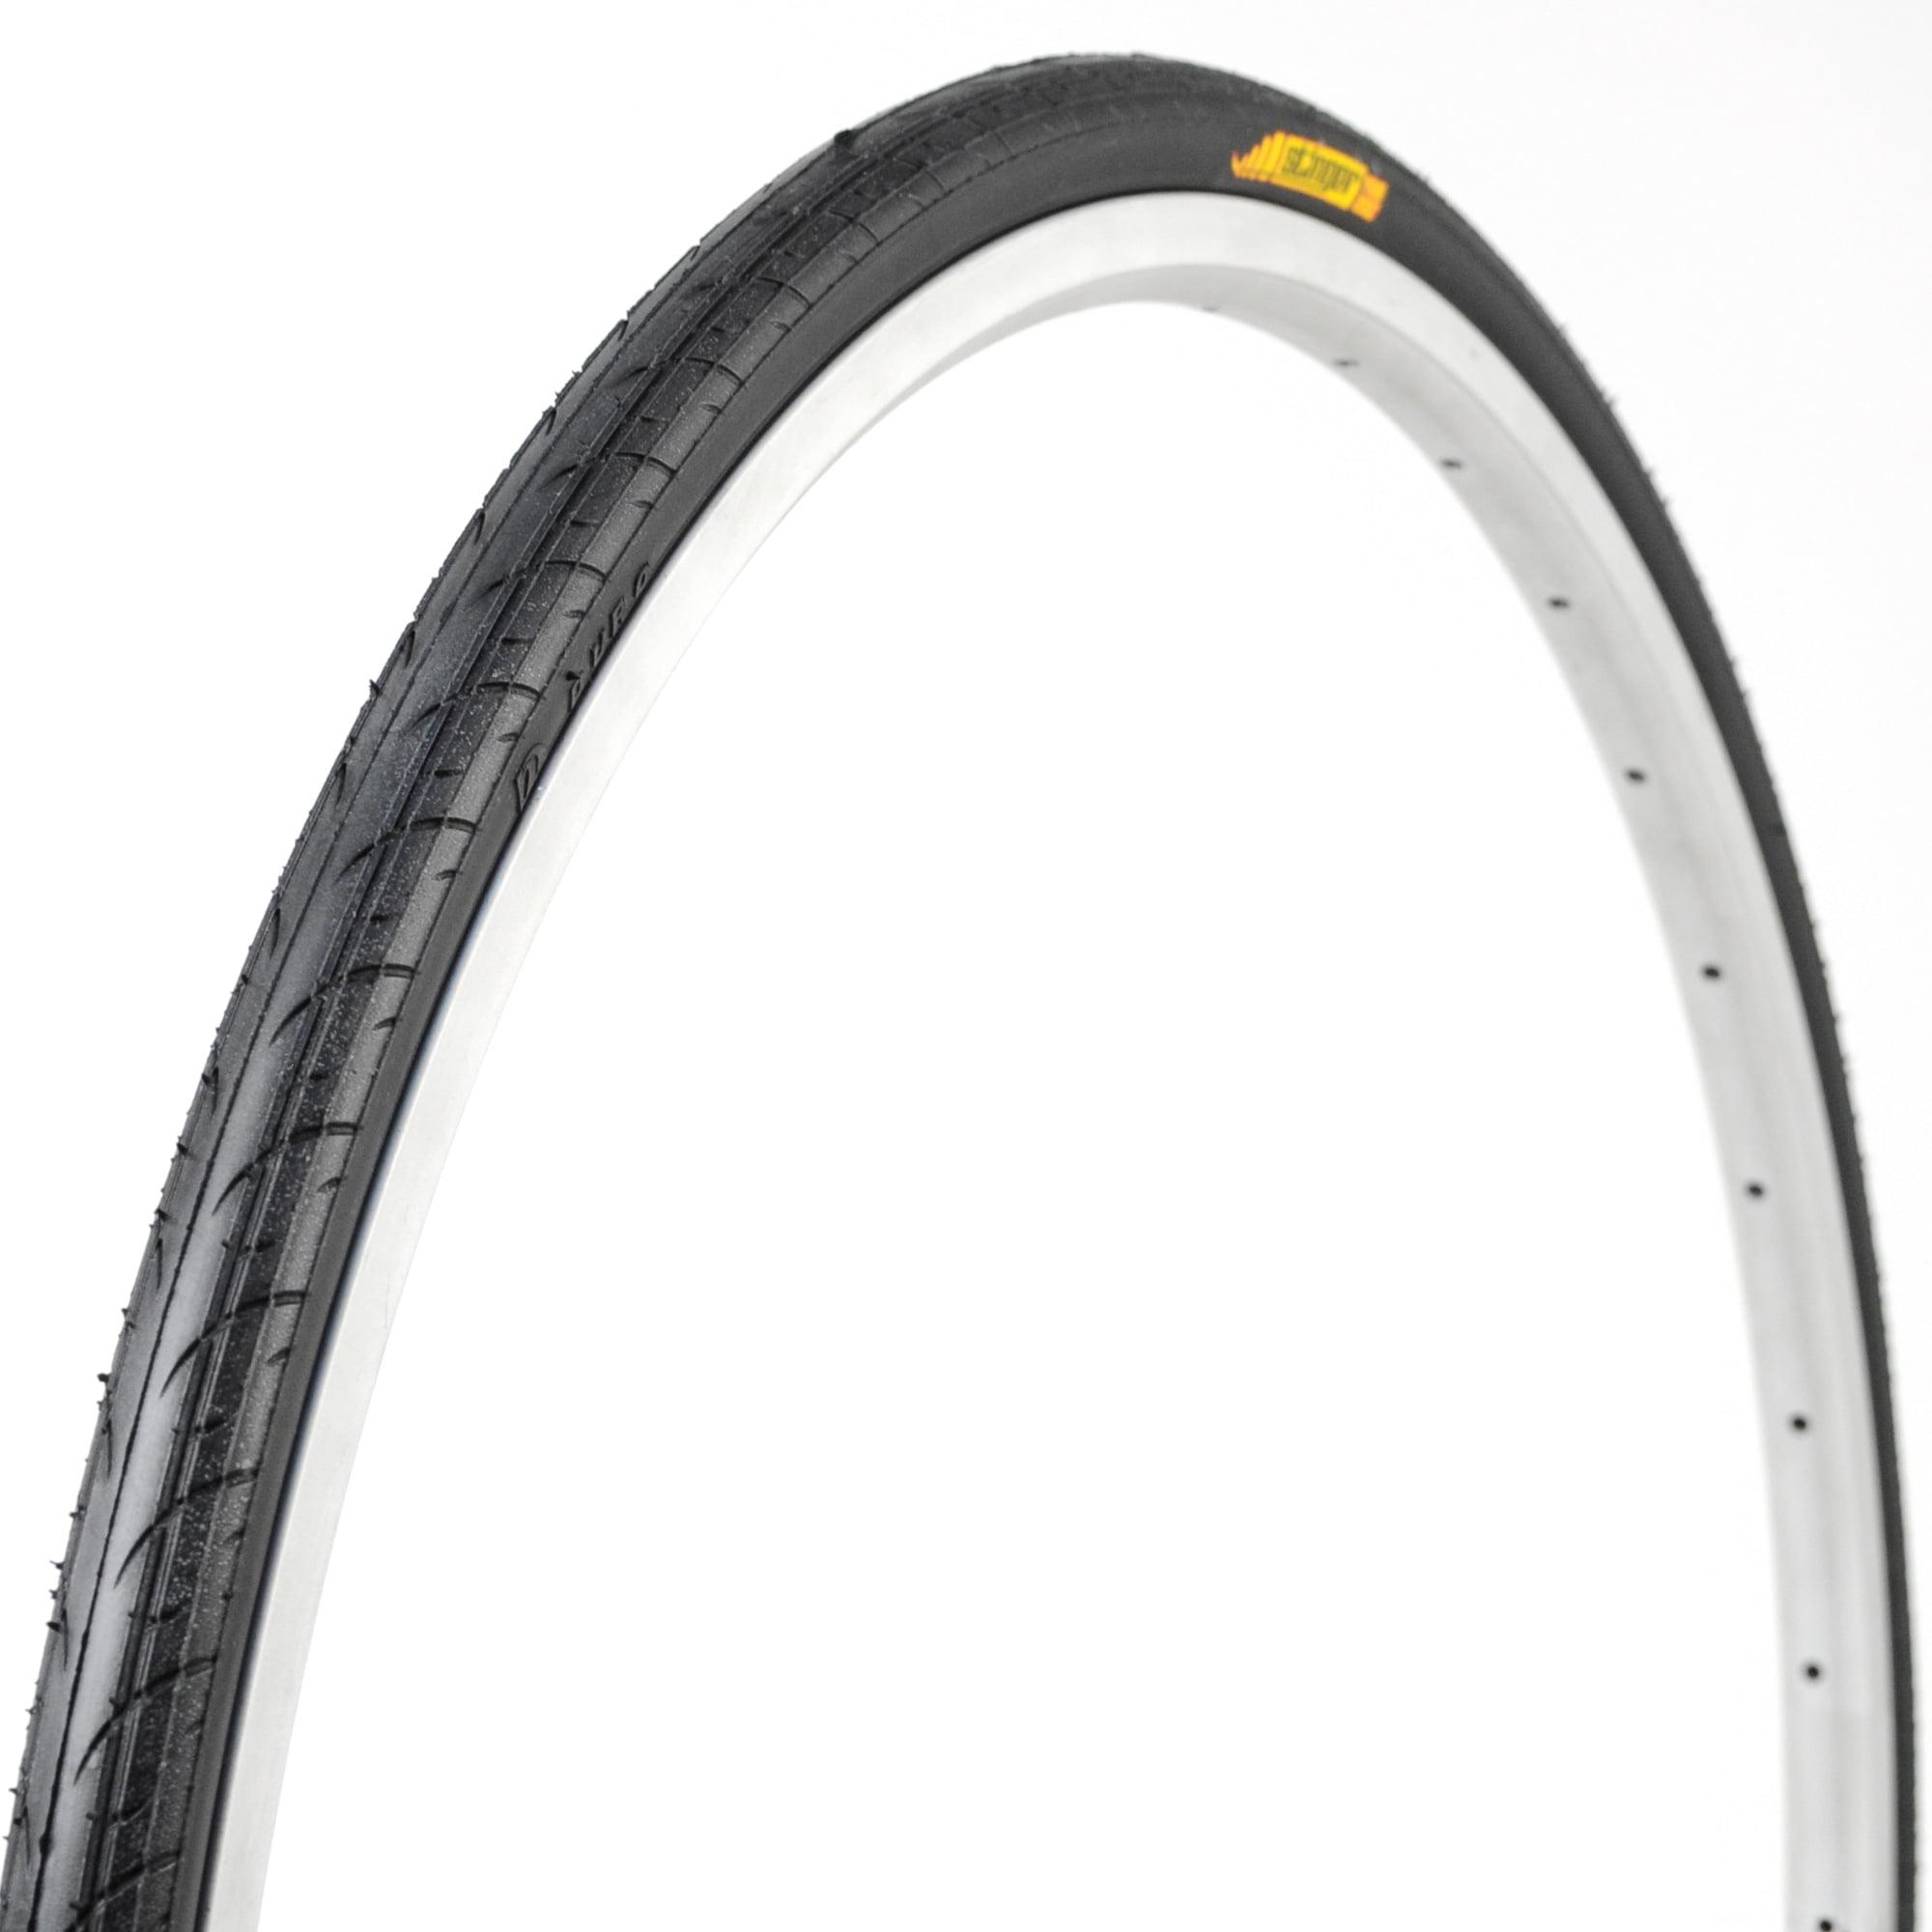 Panaracer Pasela 700x25c Lightweight Black Wall Road Bike Tire Wire Bead Light